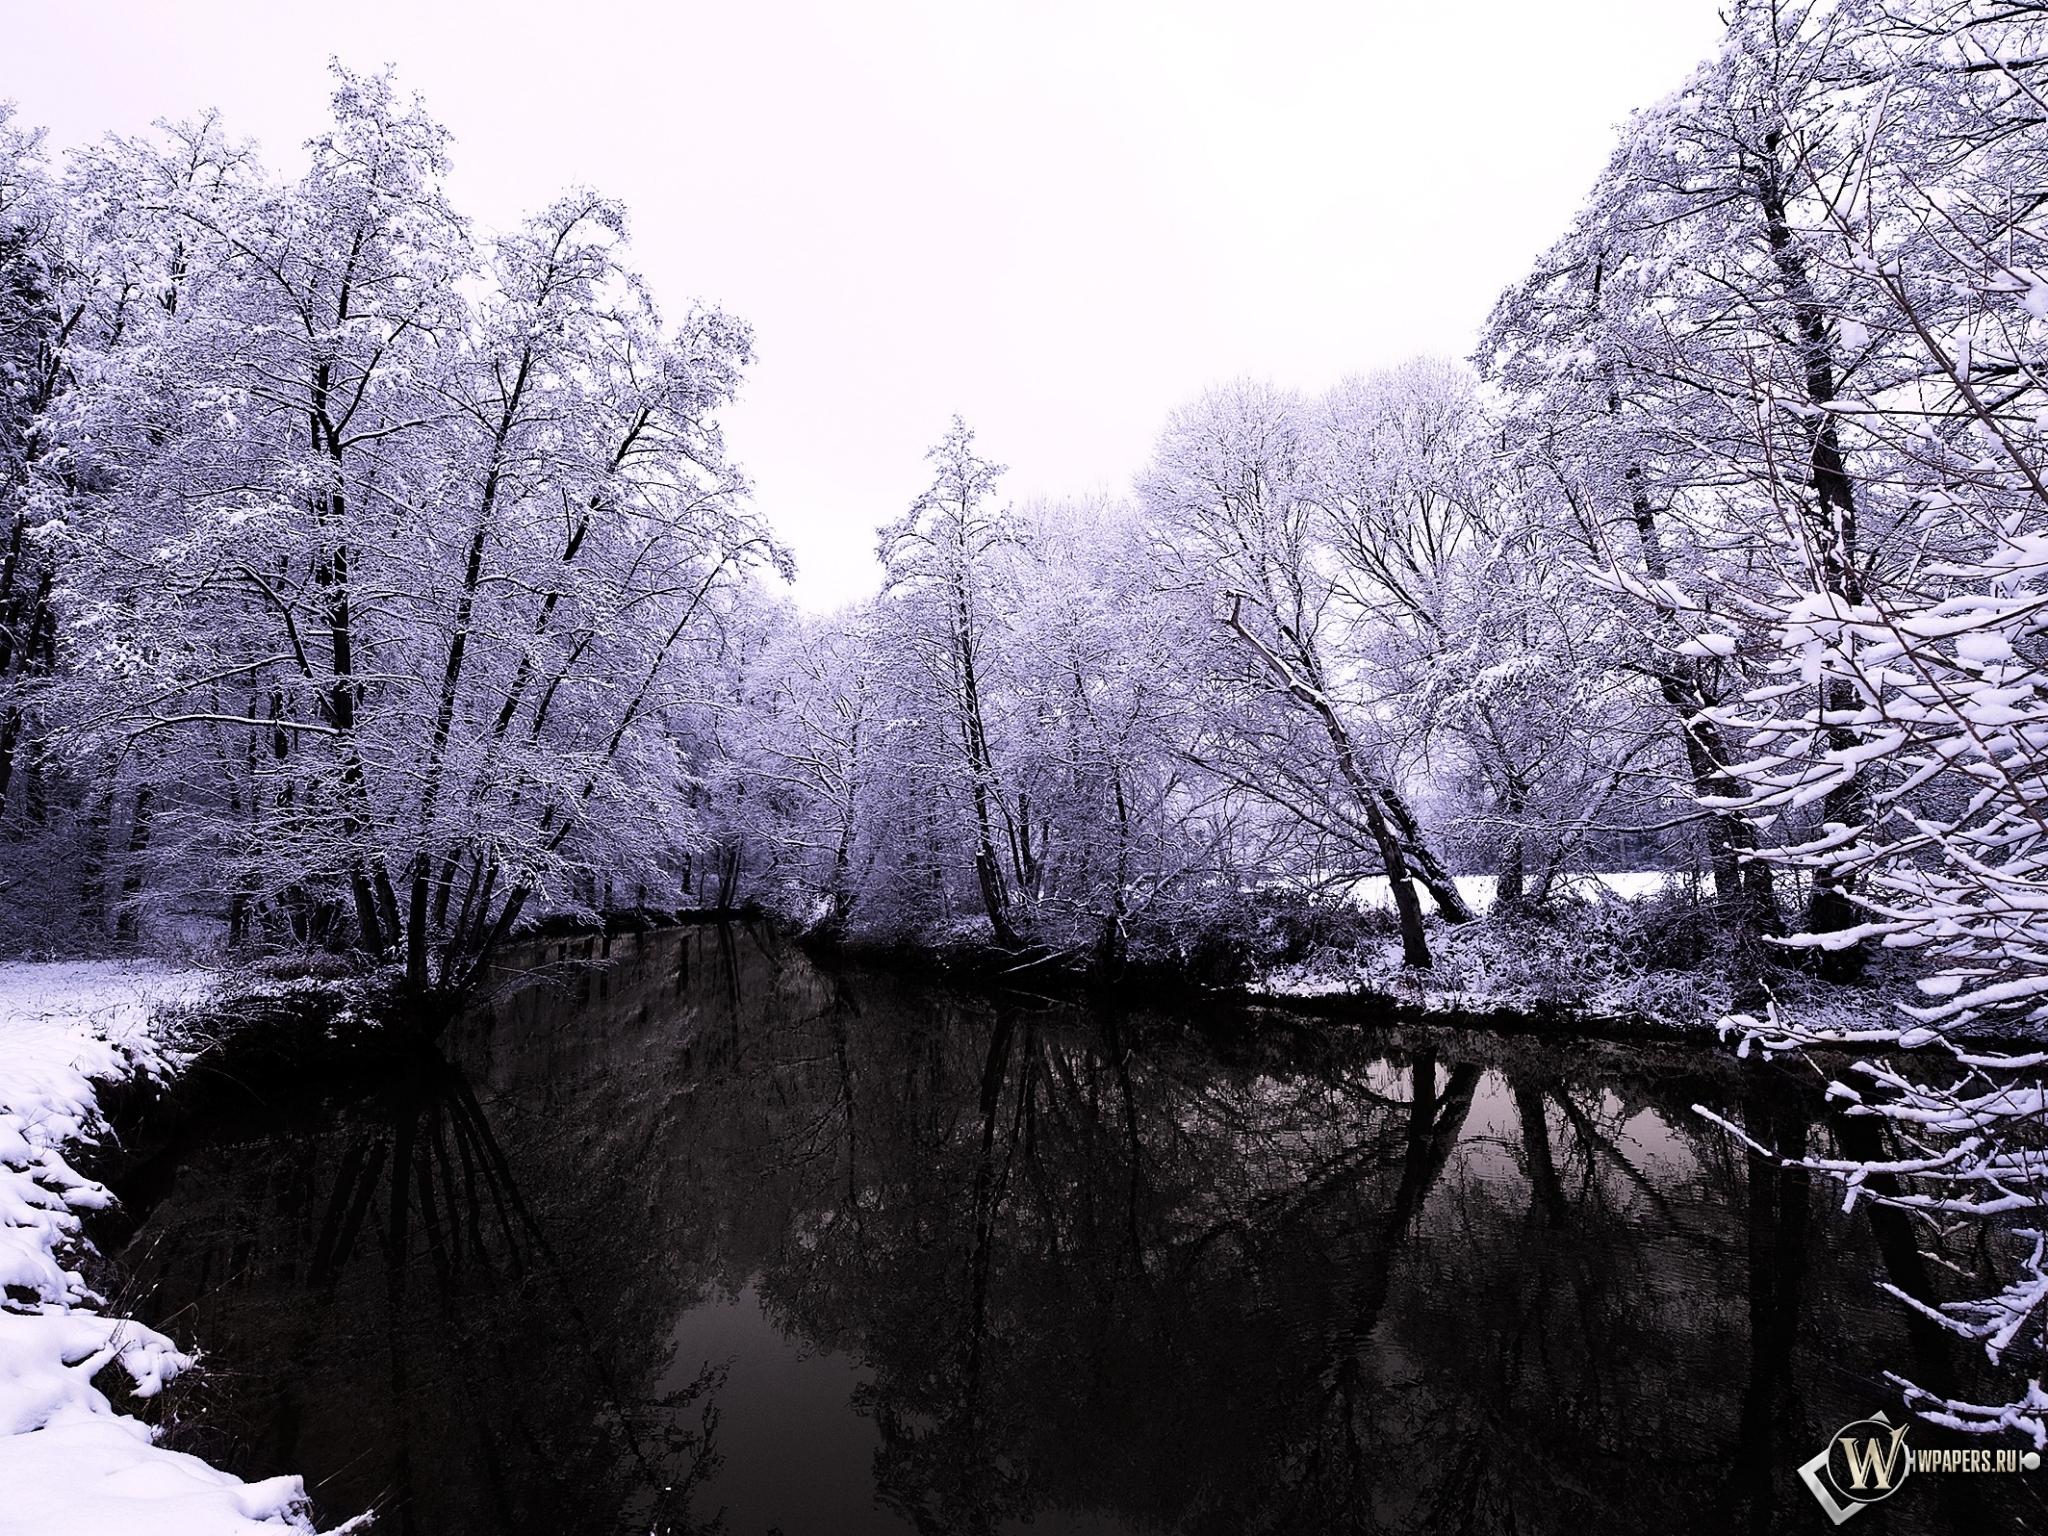 Зима снег деревья озеро небо ветки